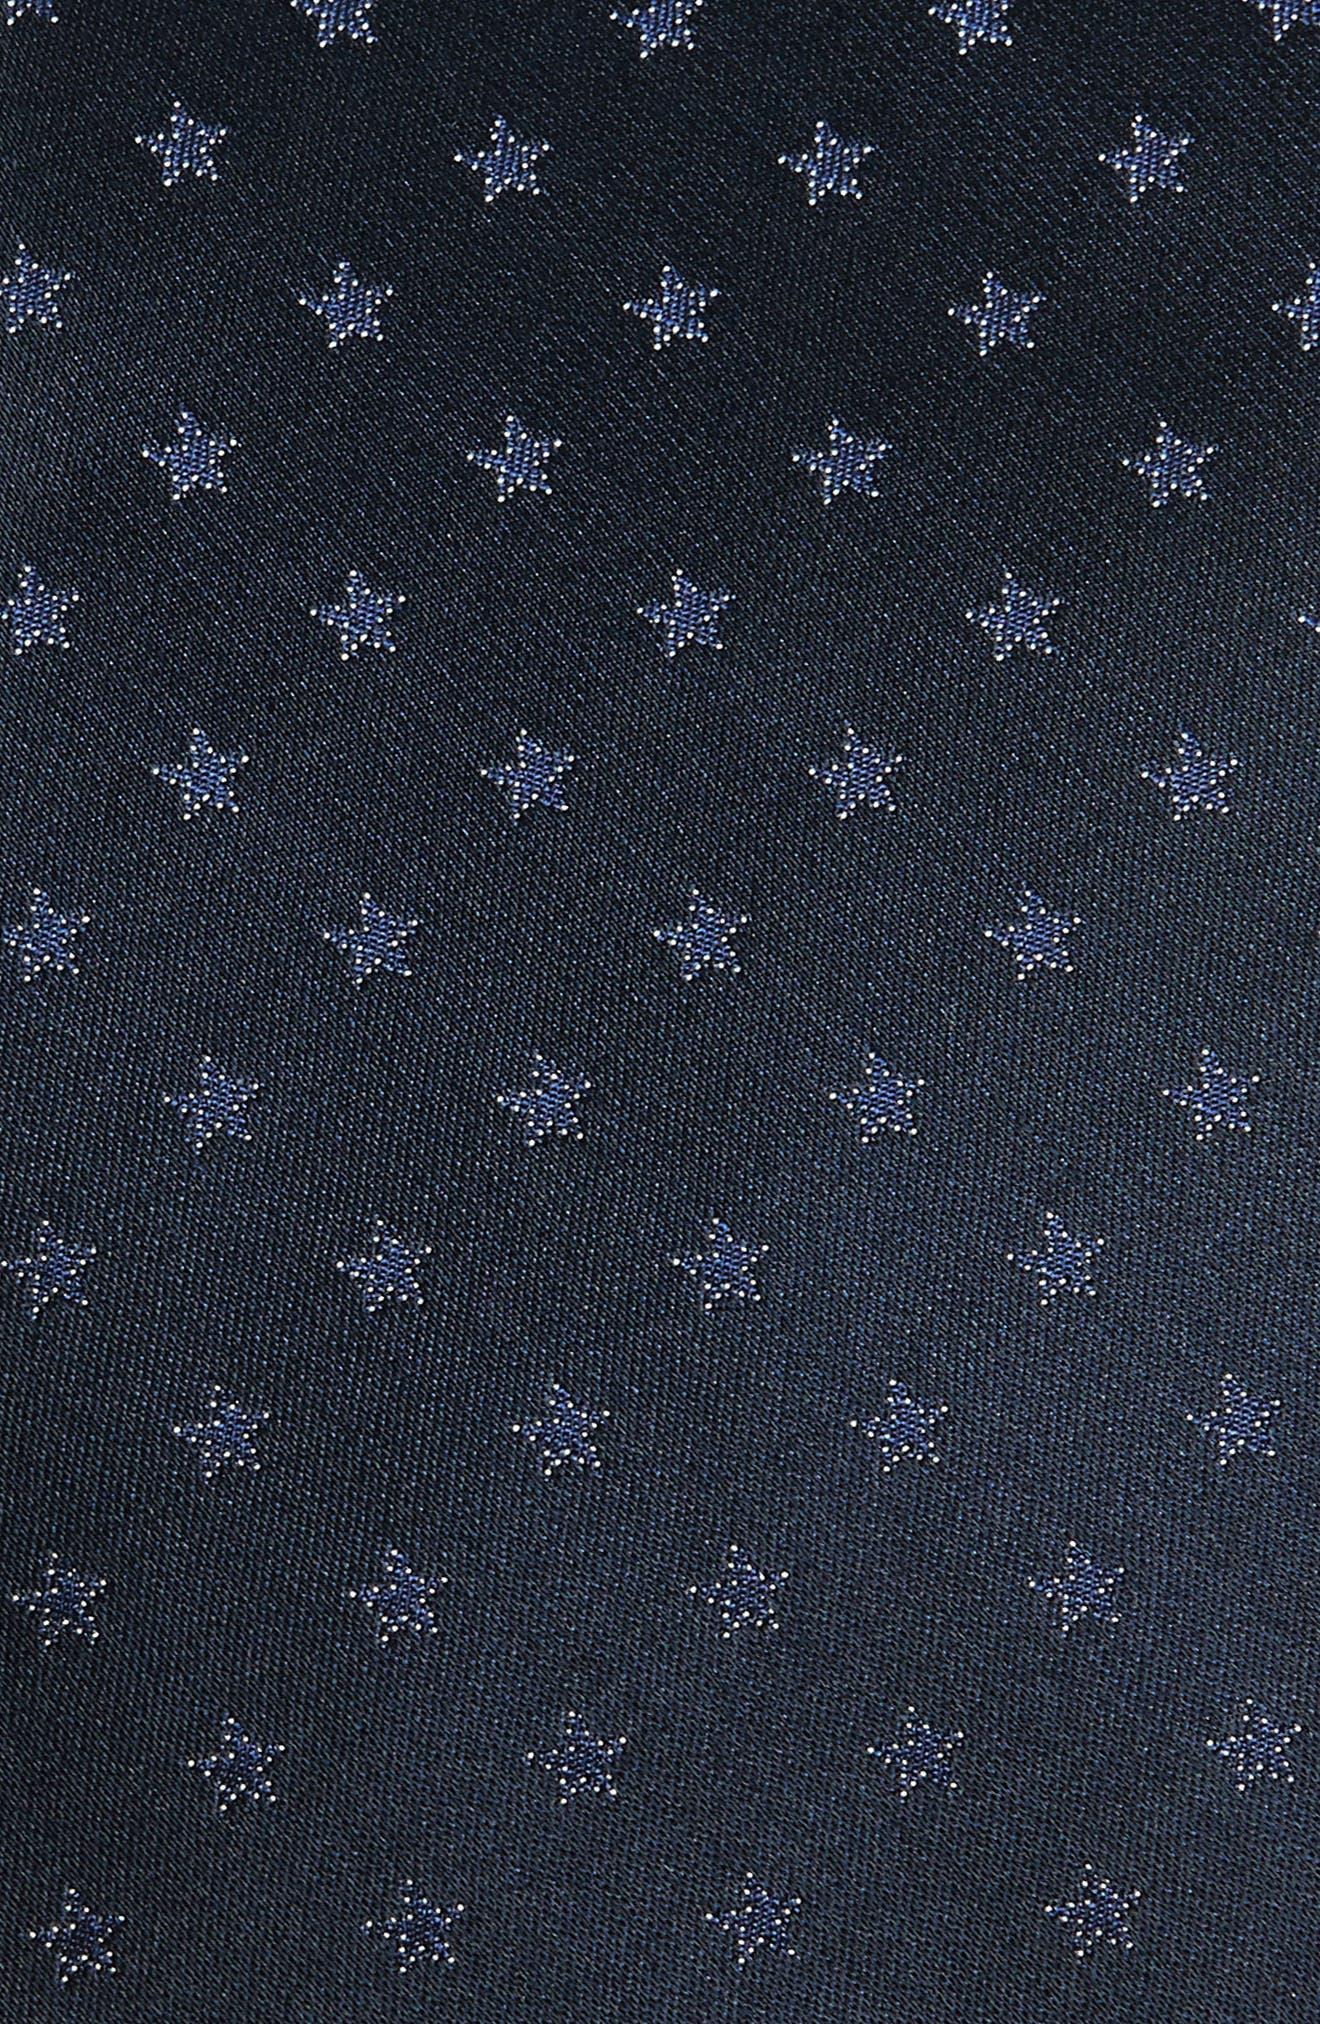 Star Silk Tie,                             Alternate thumbnail 2, color,                             405